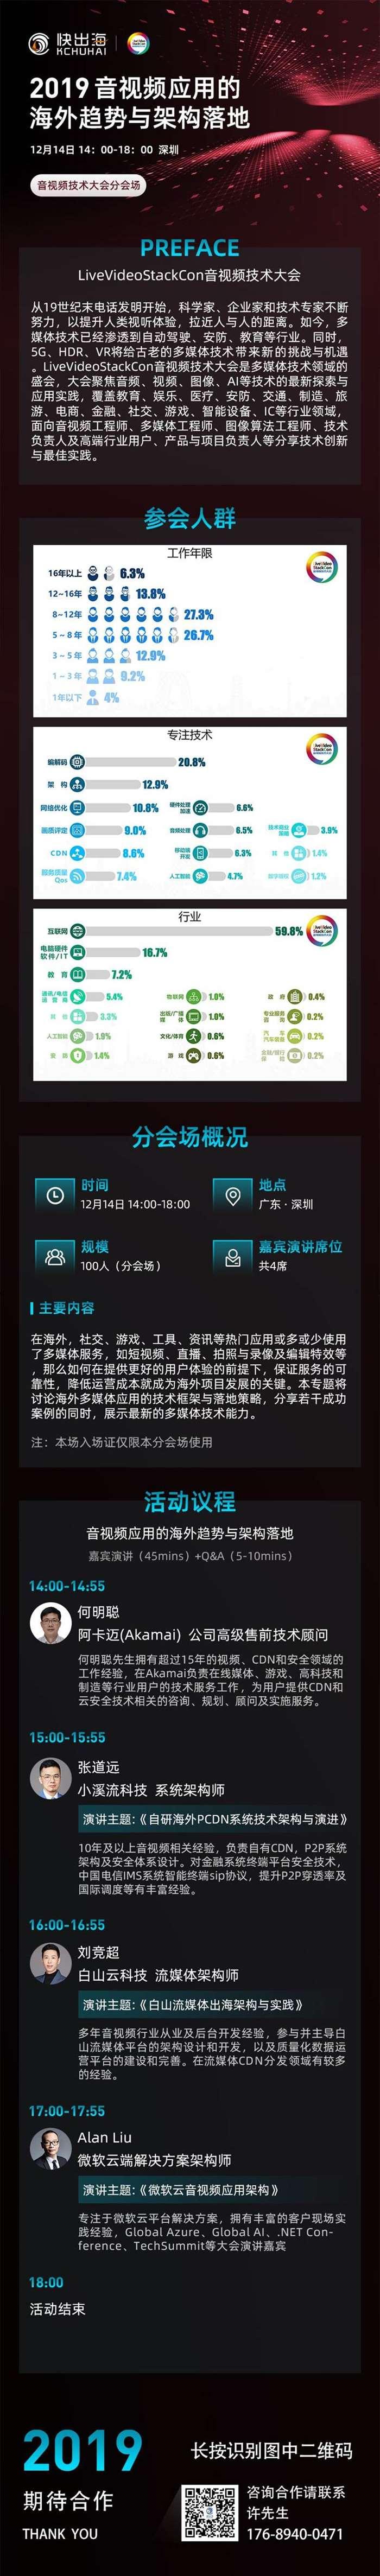 LVS深圳音视频800流程.jpg